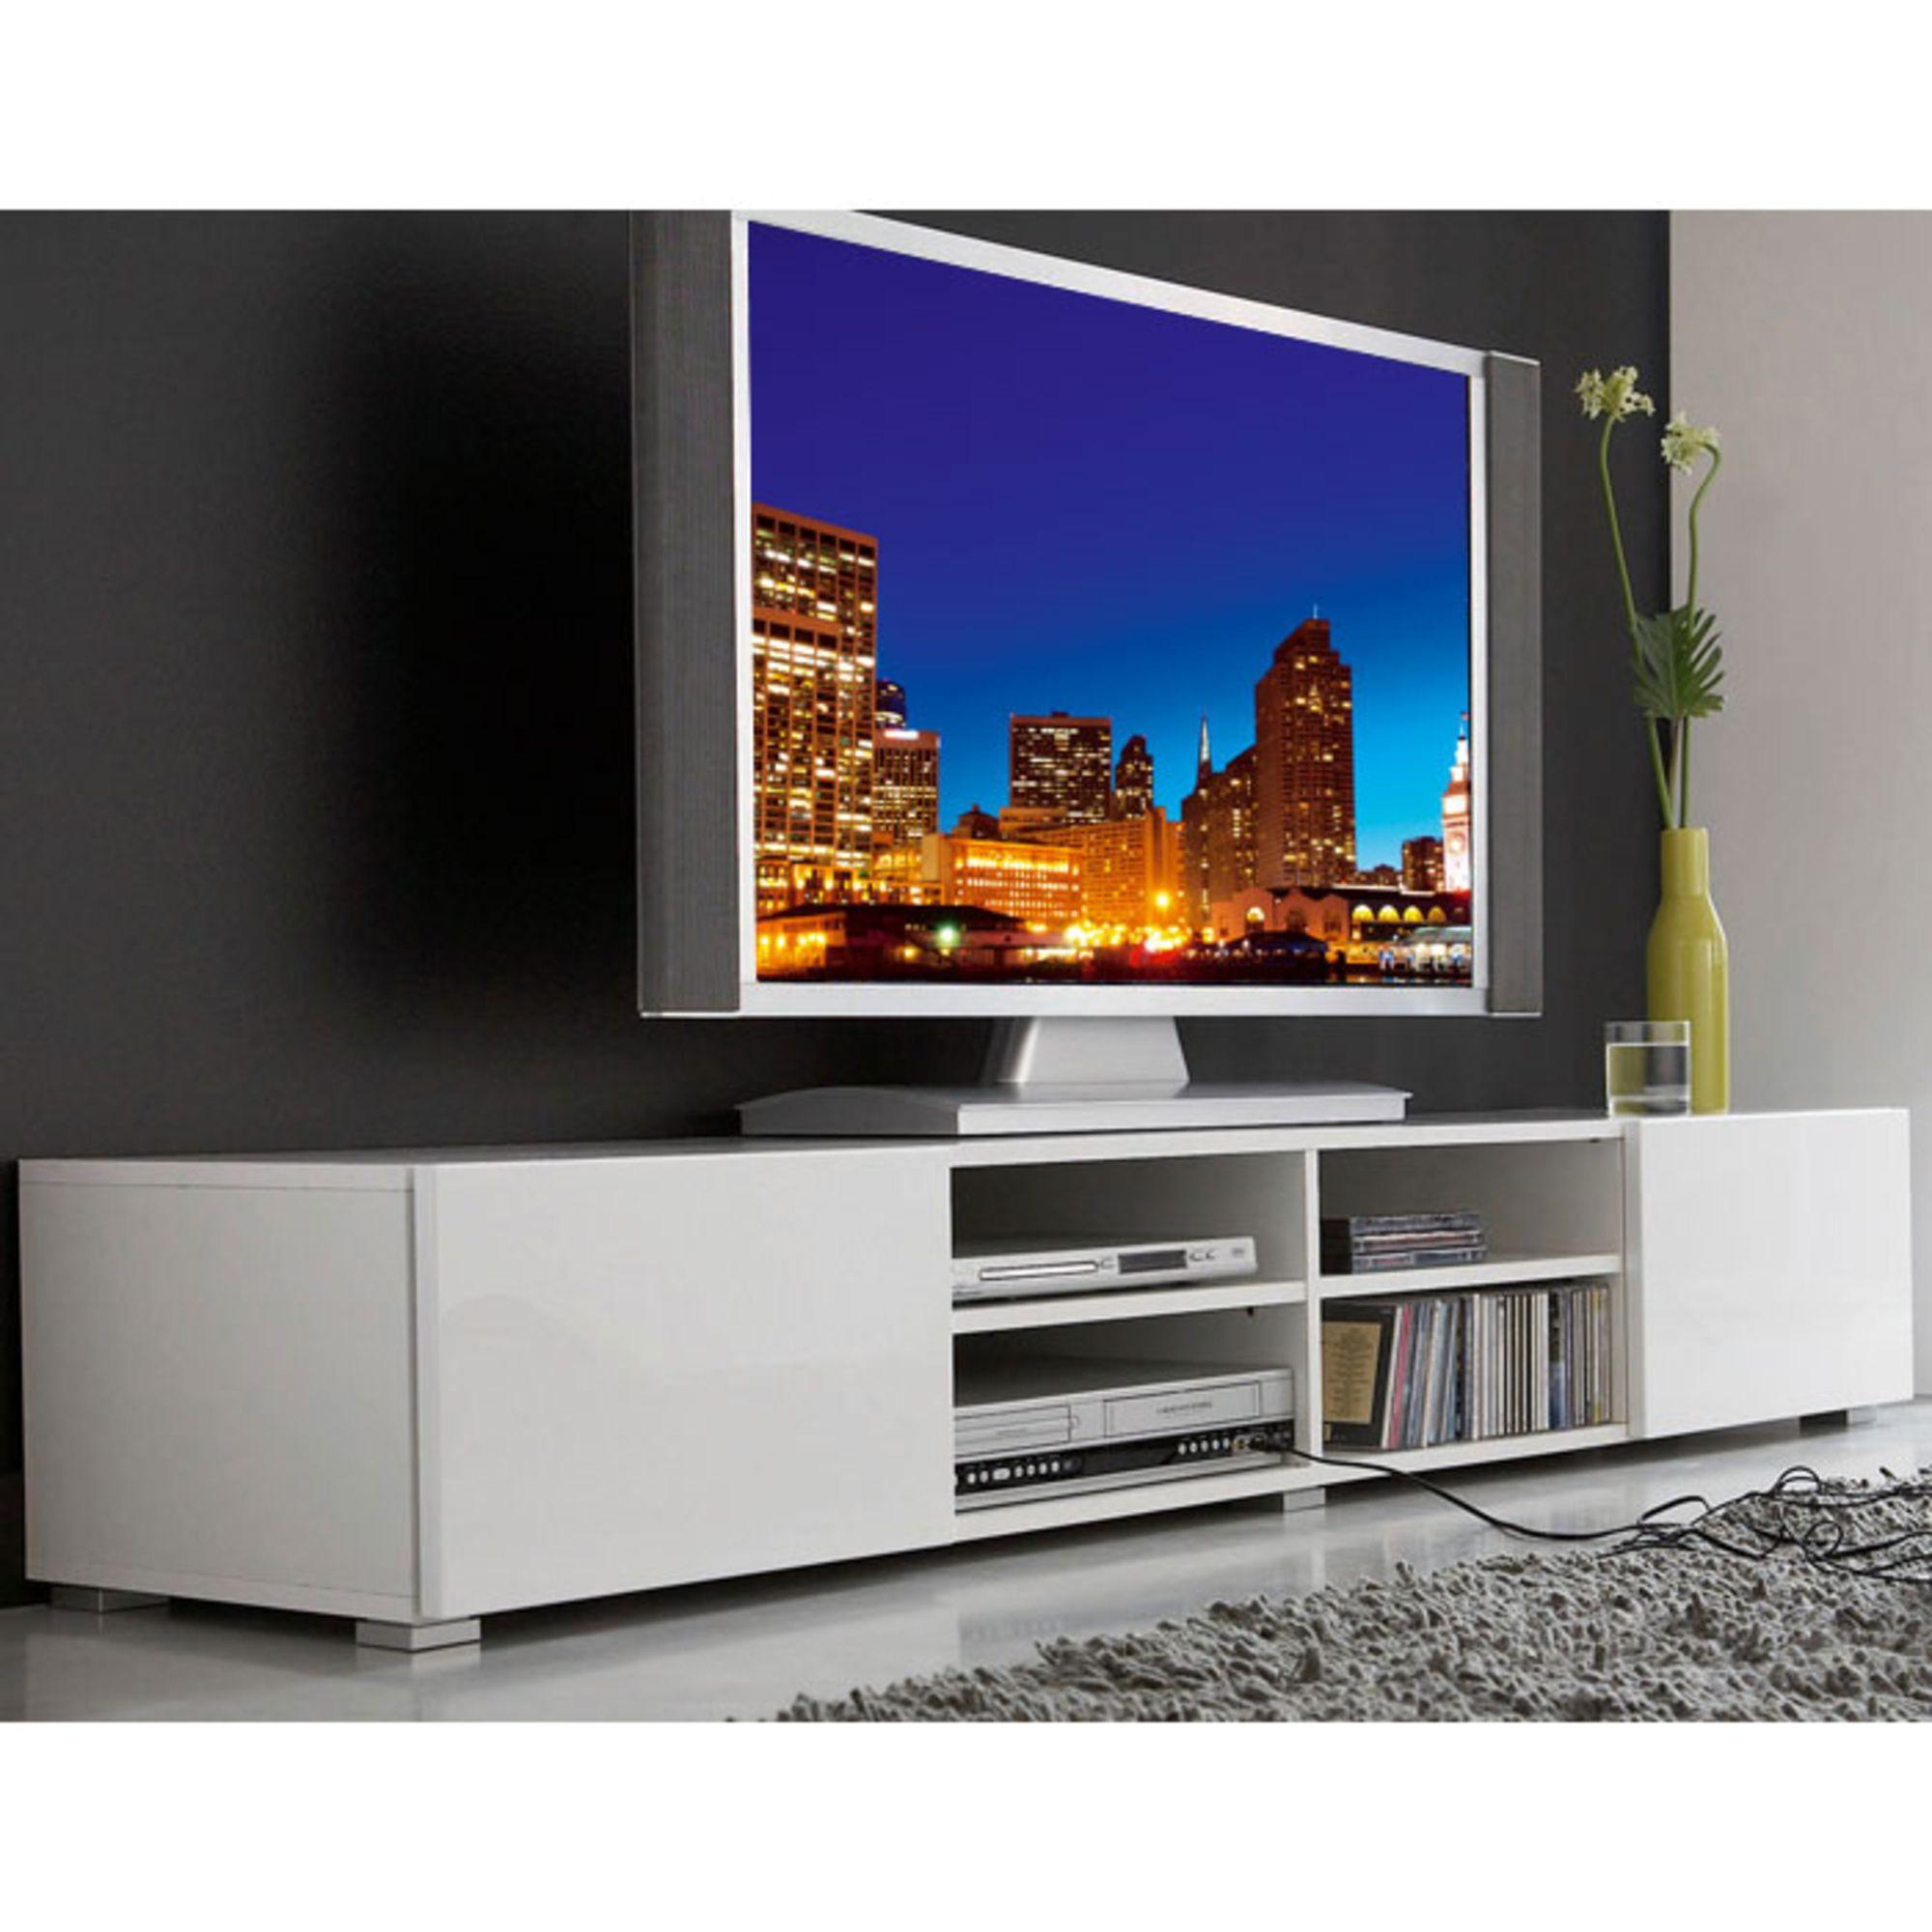 Meuble Tv 4 Niches 2 Tiroirs Magnus Blanc Prix Promo La Maison  # Promotion Meuble Tv